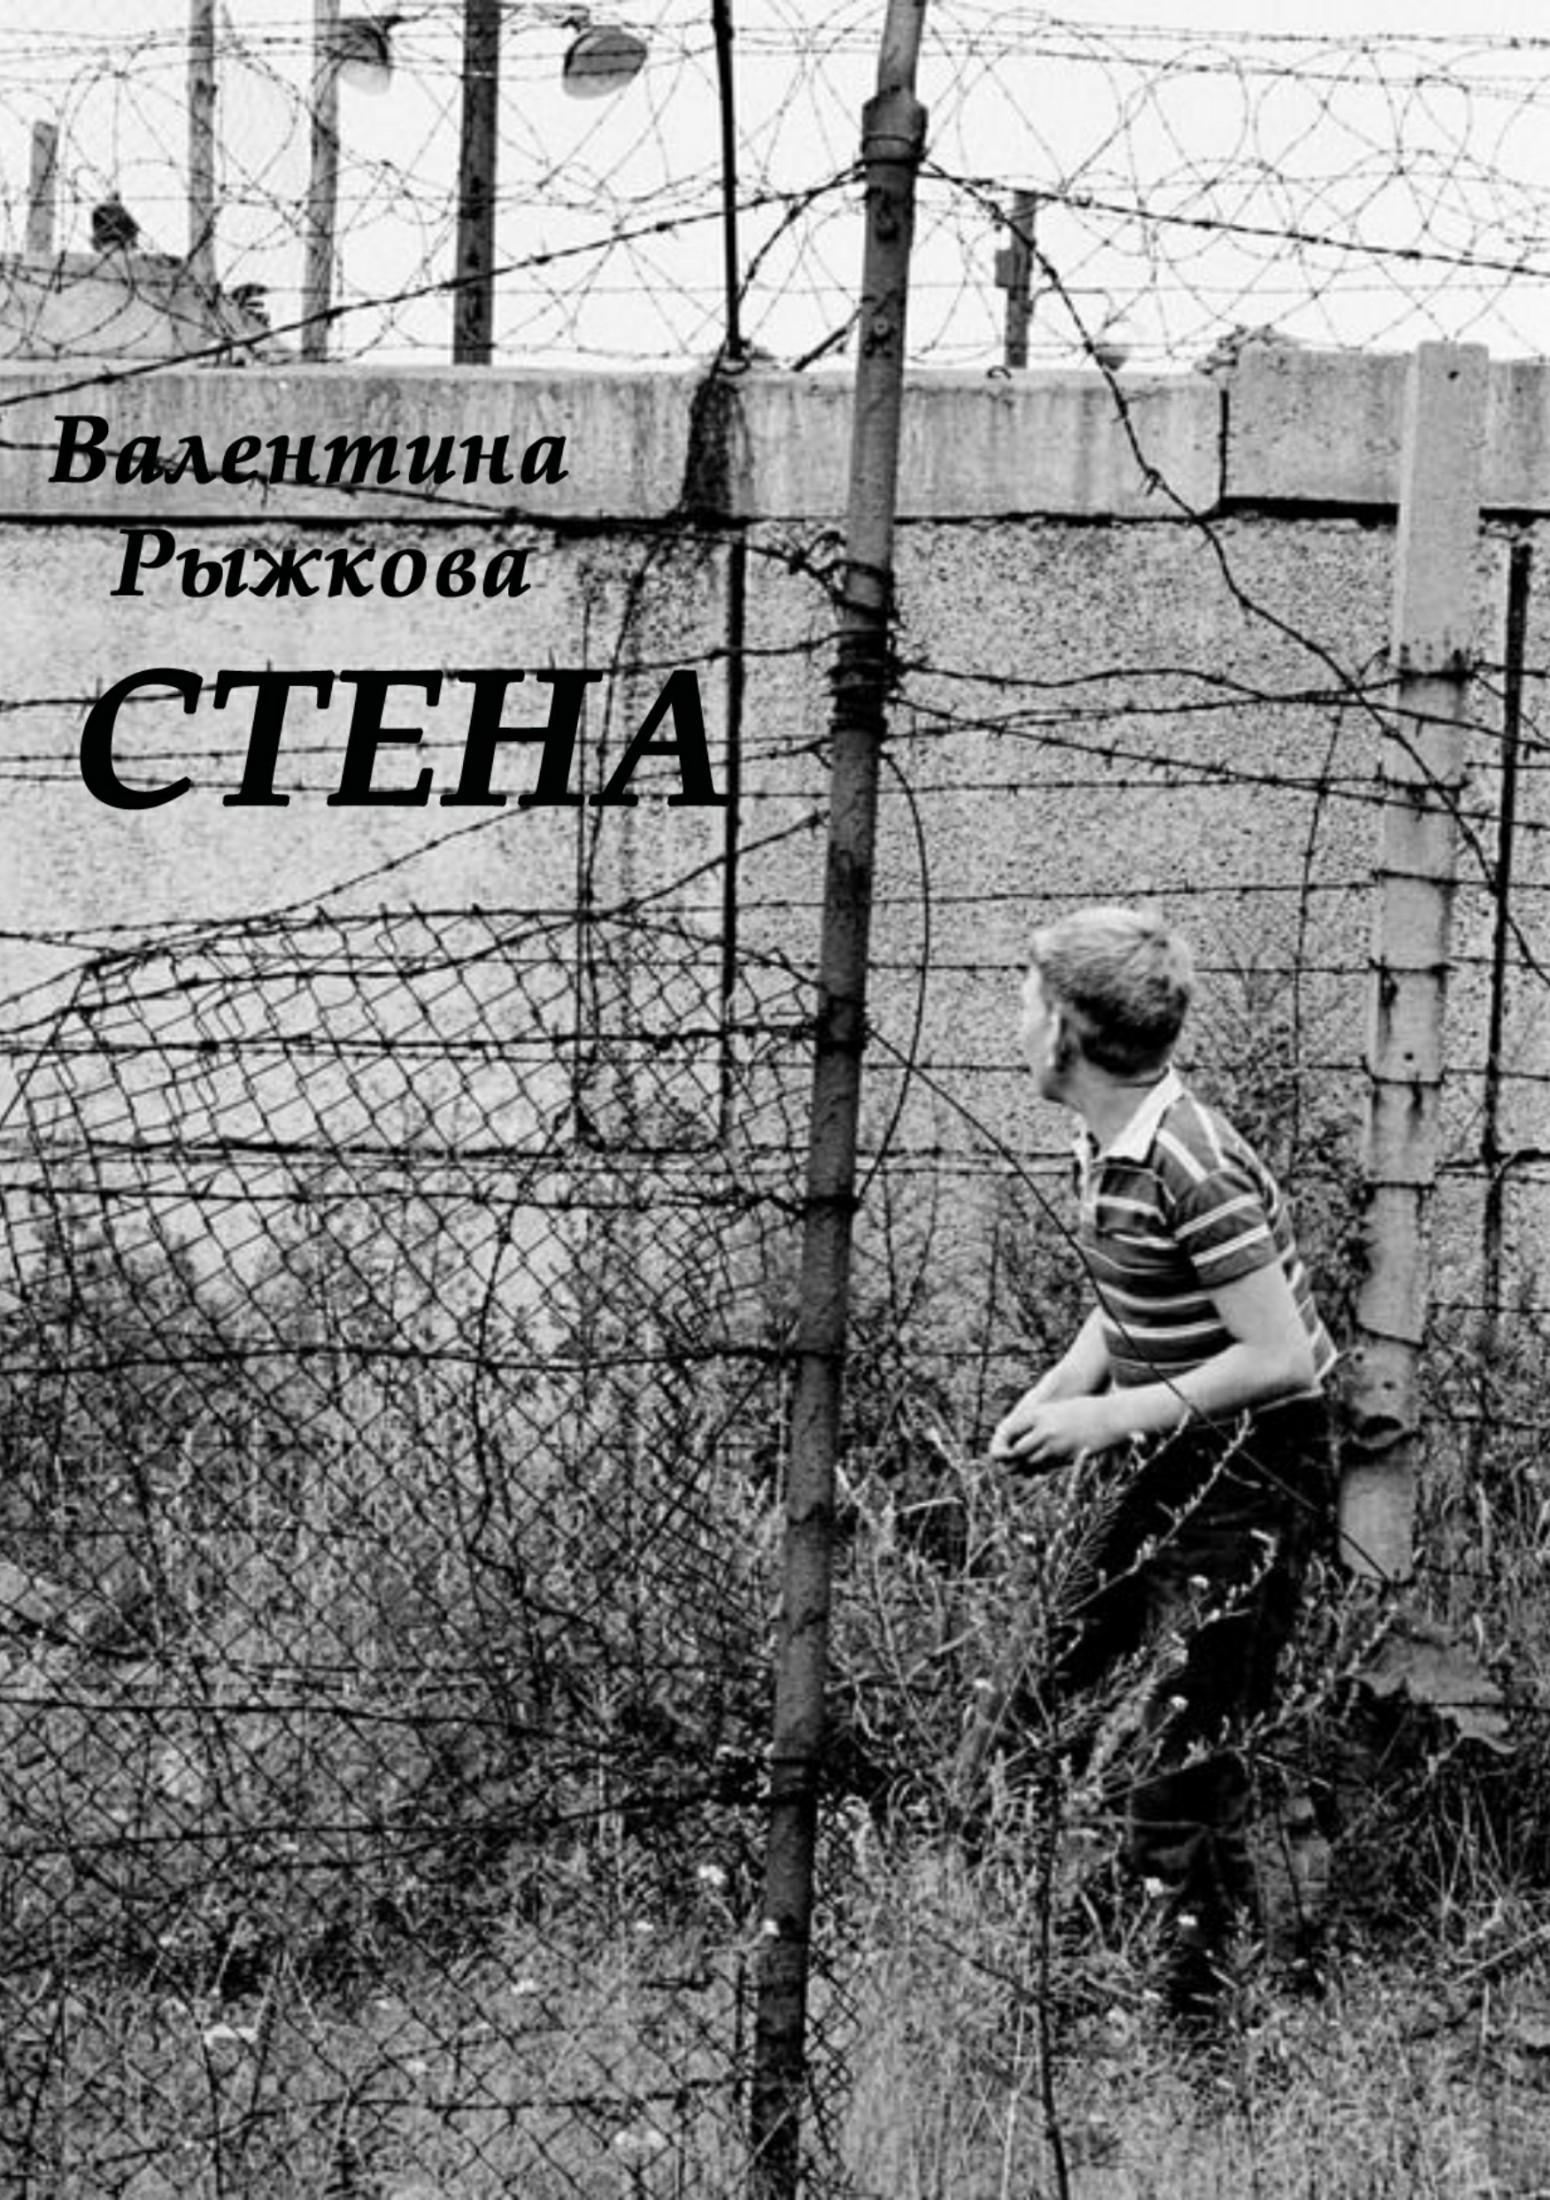 Обложка книги Стена, автор Валентина Ивановна Рыжкова